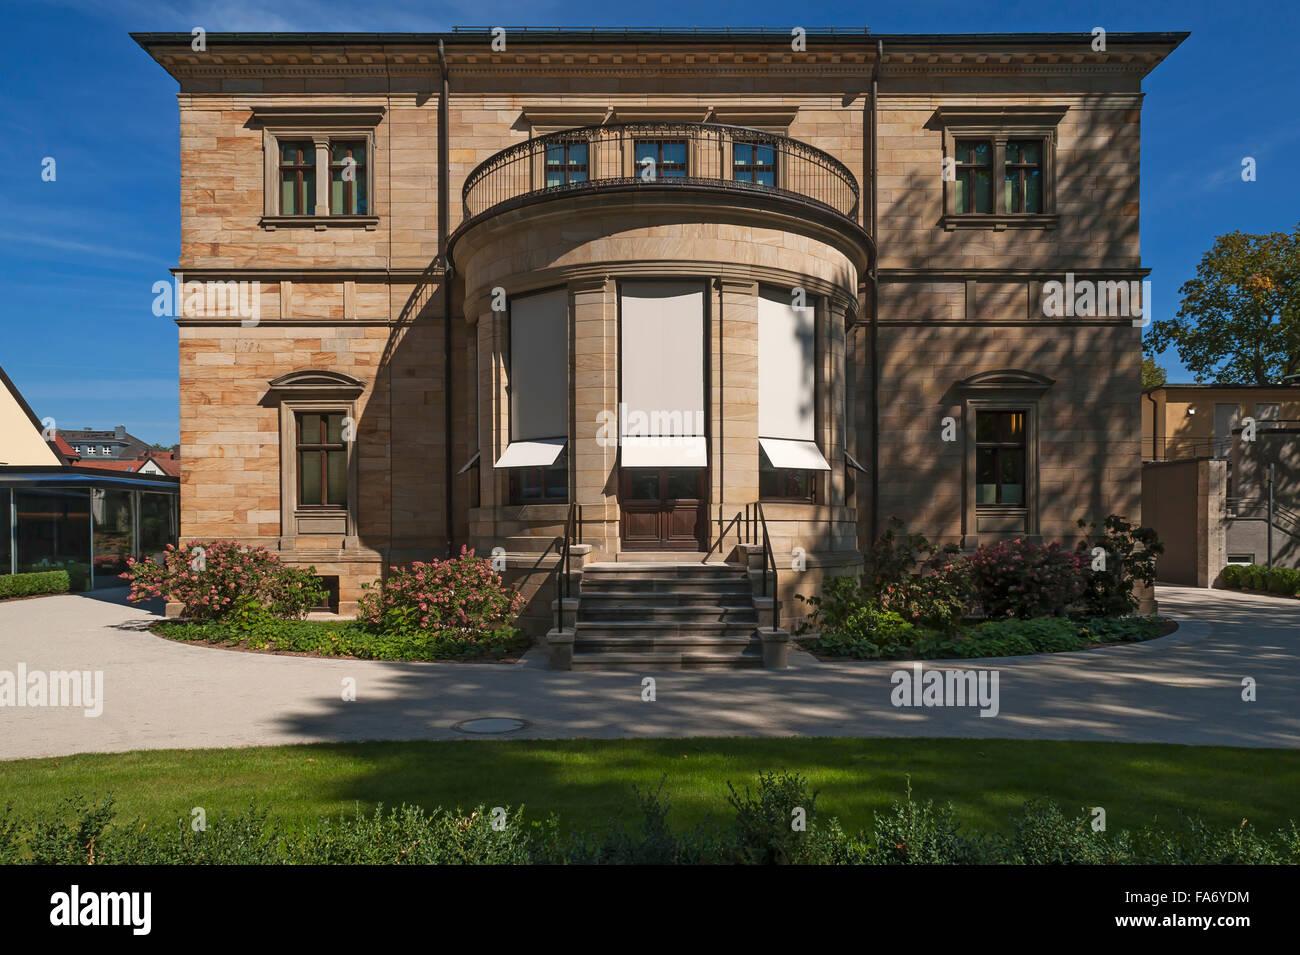 Villa Wahnfried, home of Richard Wagner, 1813-1883, Bayreuth, Upper Franconia, Bavaria, Germany Stock Photo